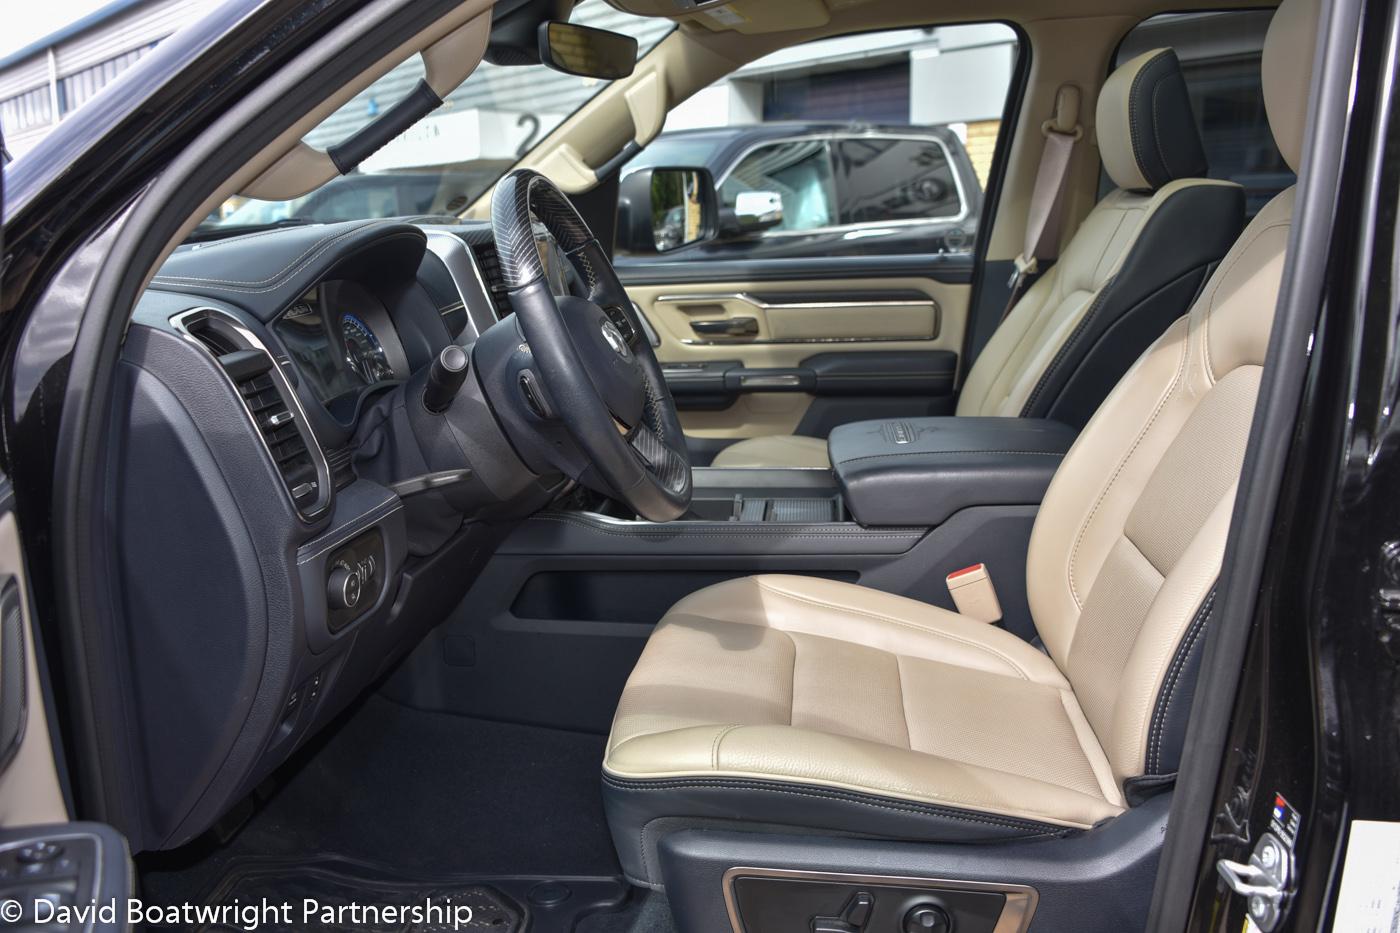 2019 Dodge RAM Limited Light Interior